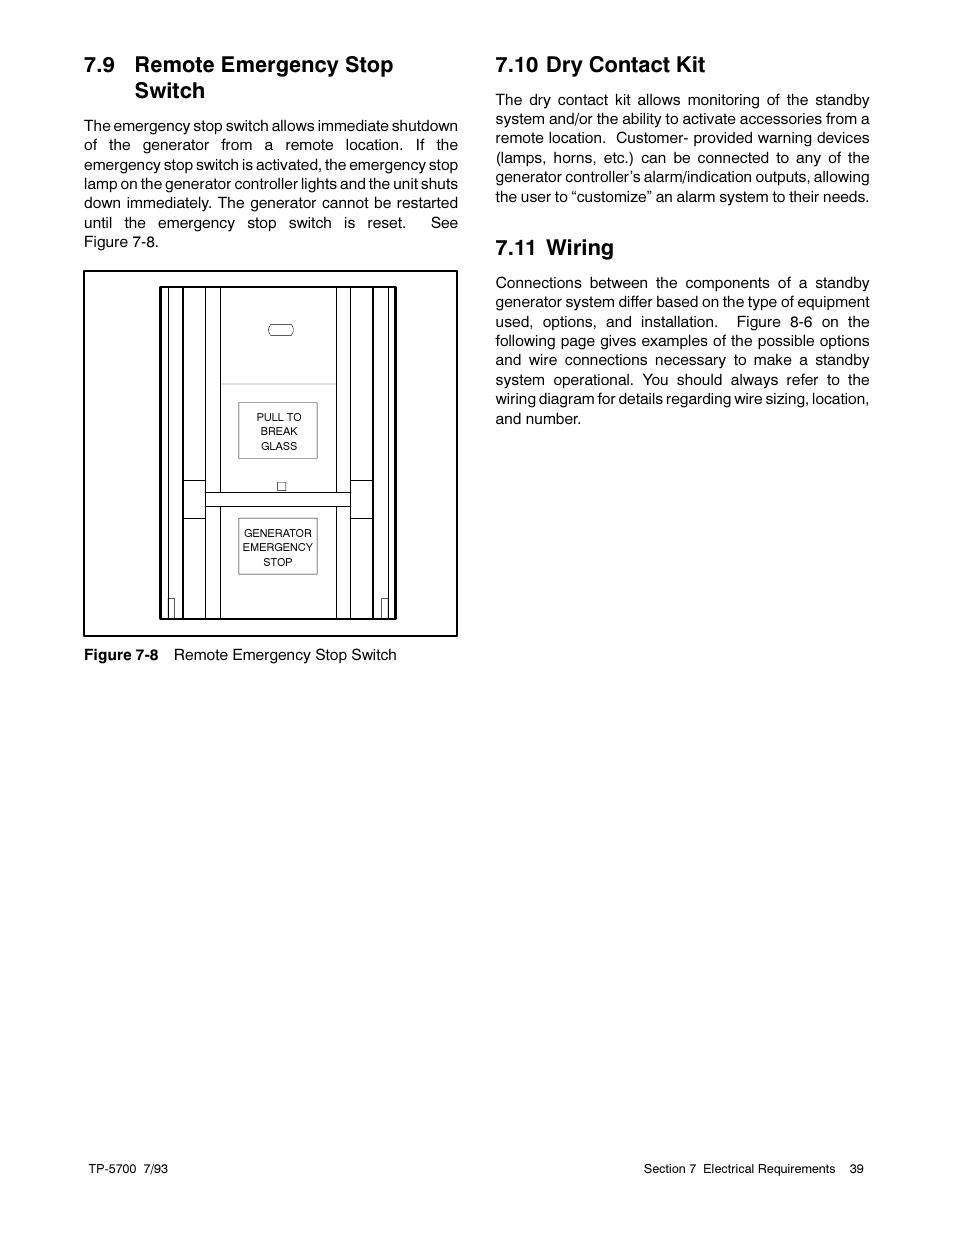 emergency stop switch wiring diagram 9 remote emergency stop switch  10 dry contact kit  11 wiring  9 remote emergency stop switch  10 dry